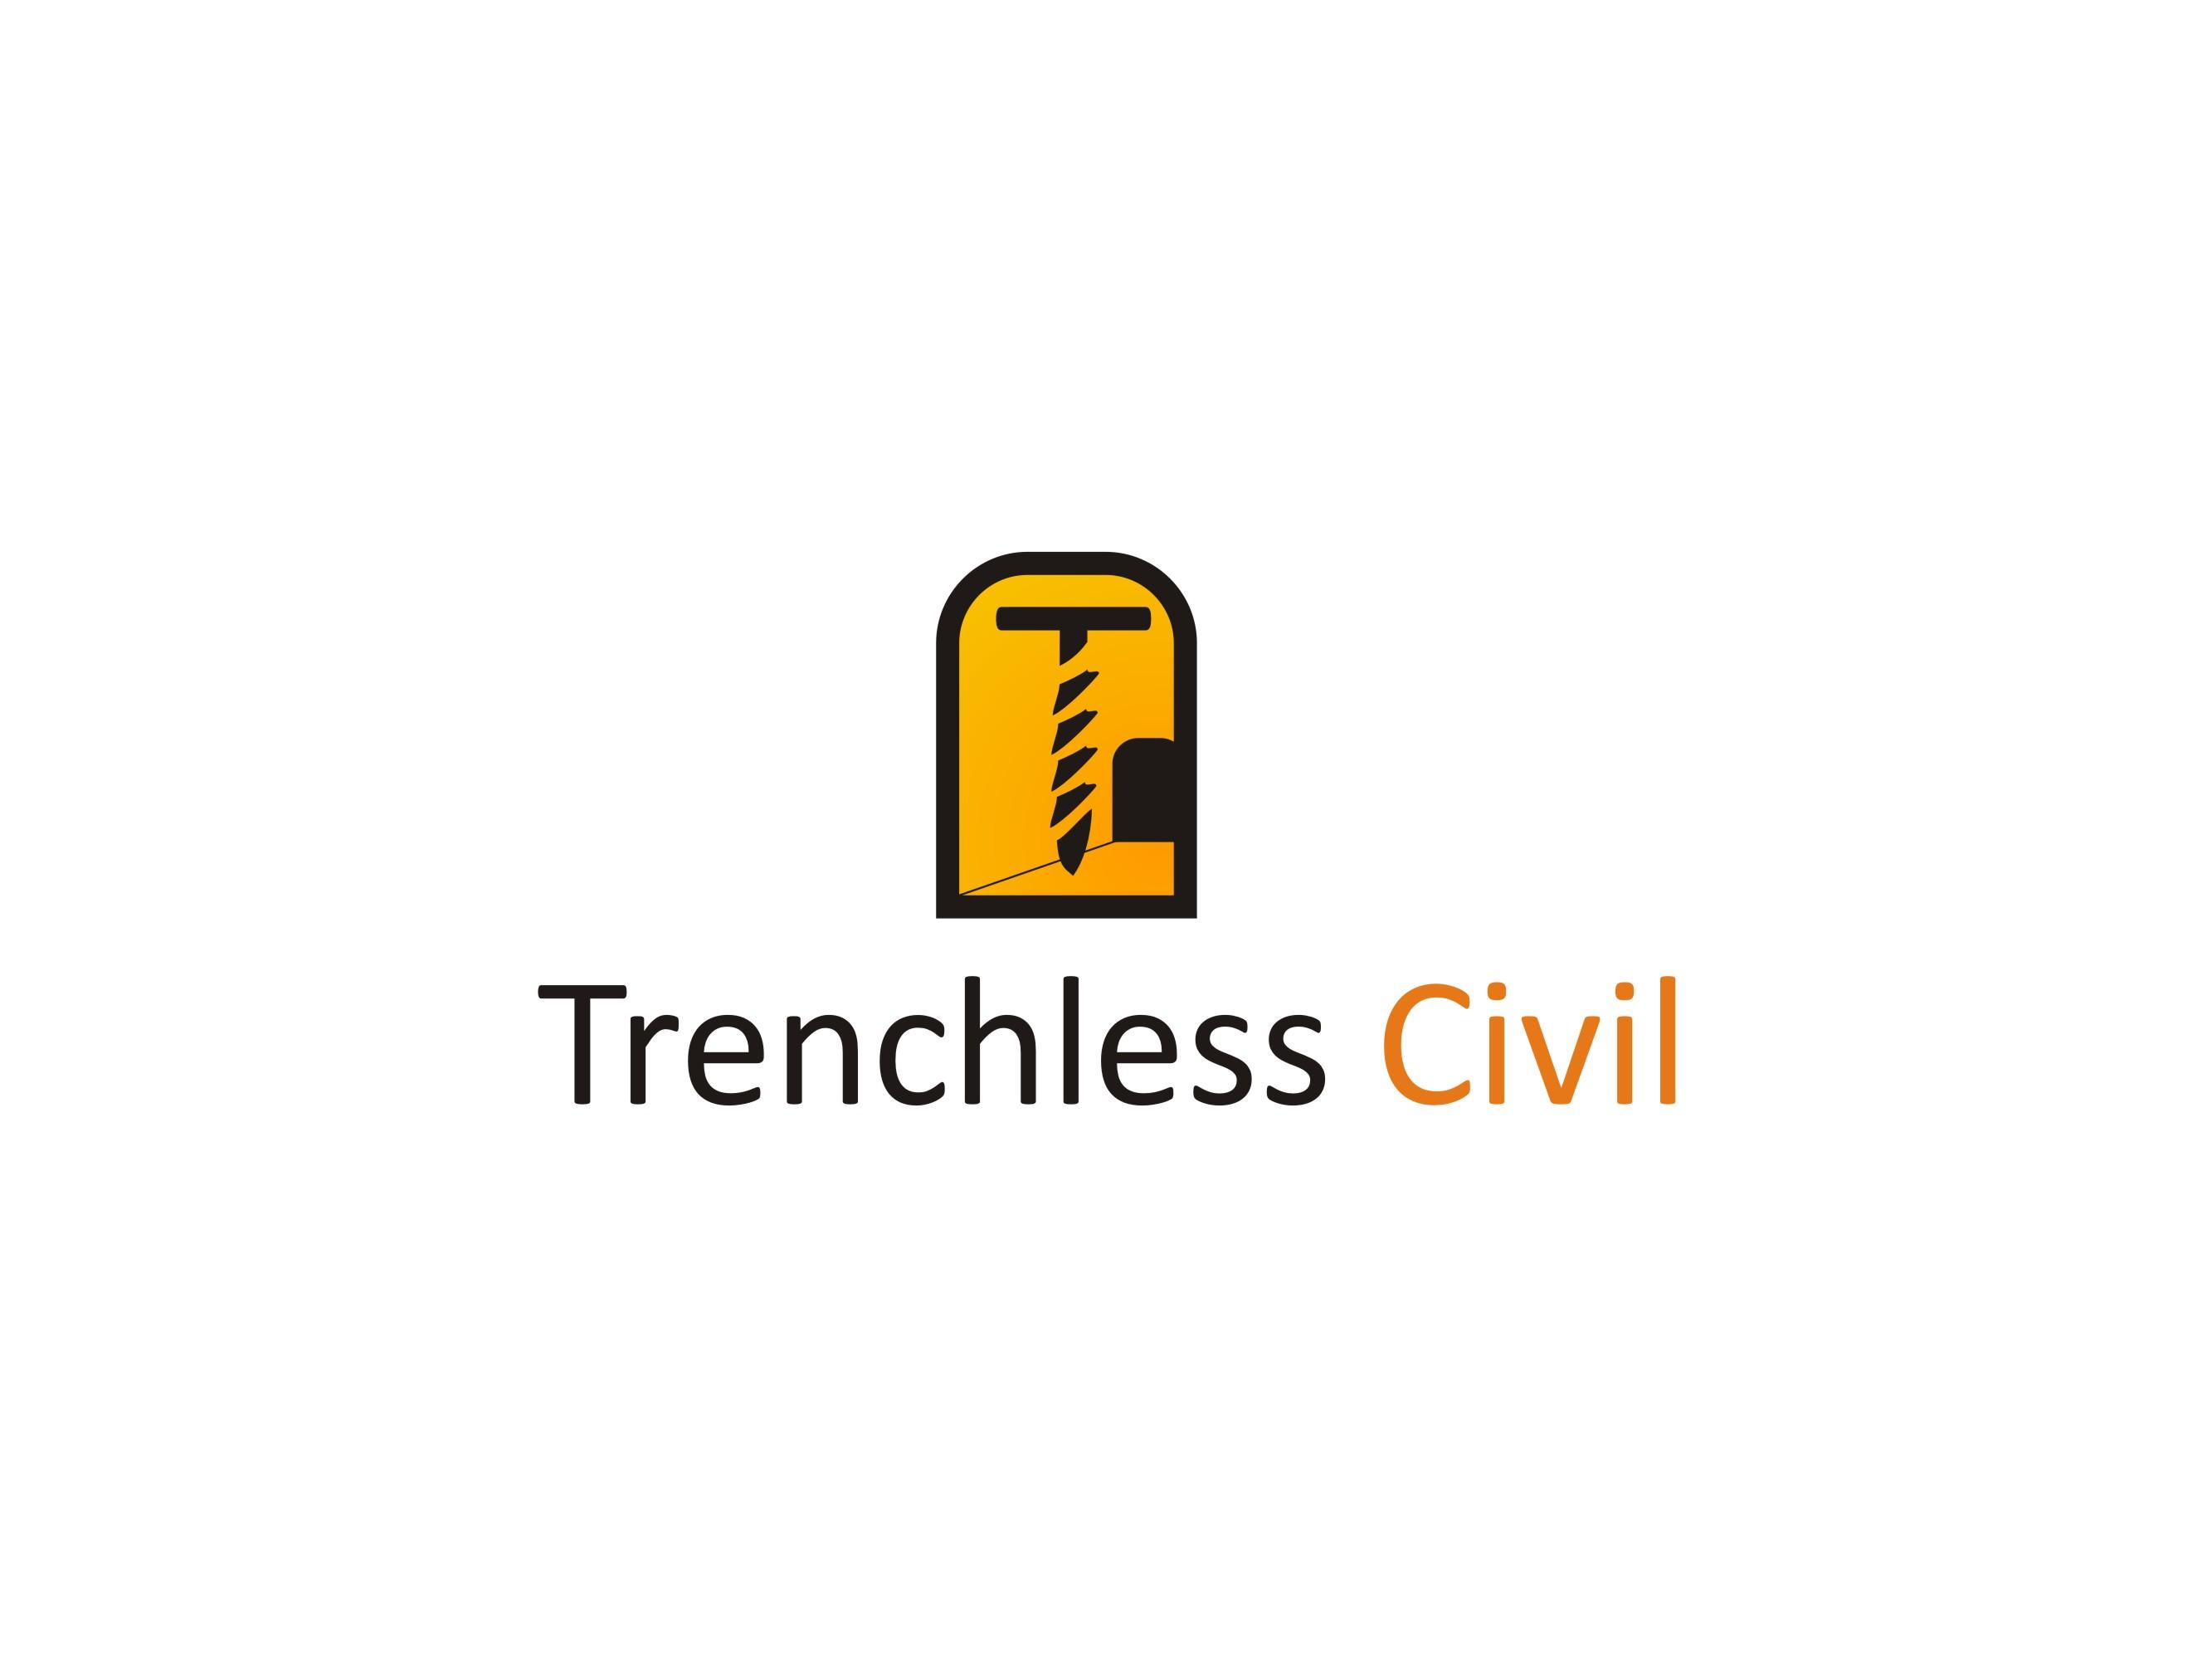 I Will Design Professional cool Logo